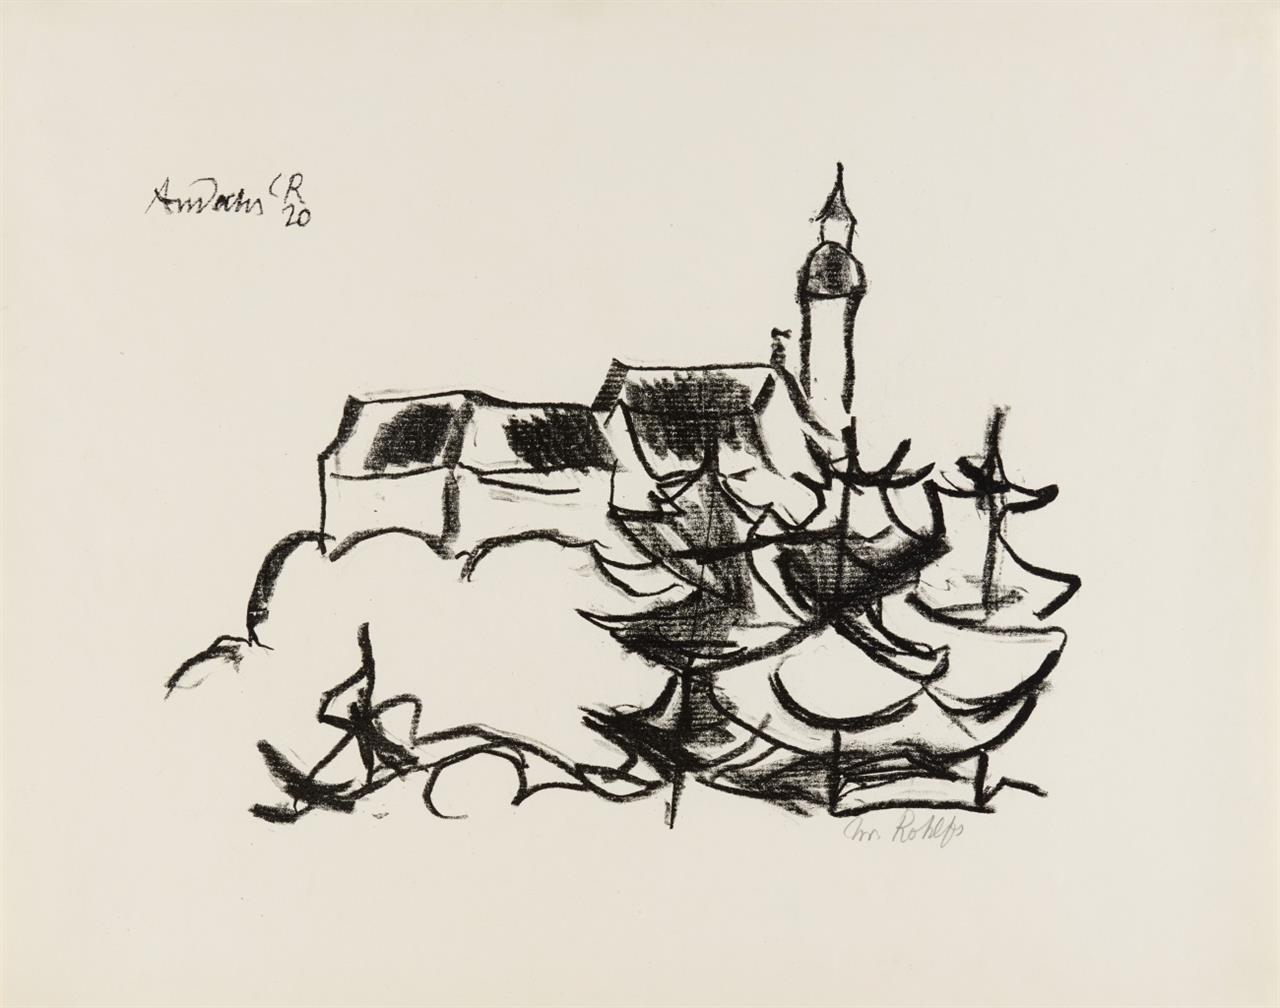 Christian Rohlfs. Kloster Andechs. 1920. Lithographie. Signiert. Utermann 168.